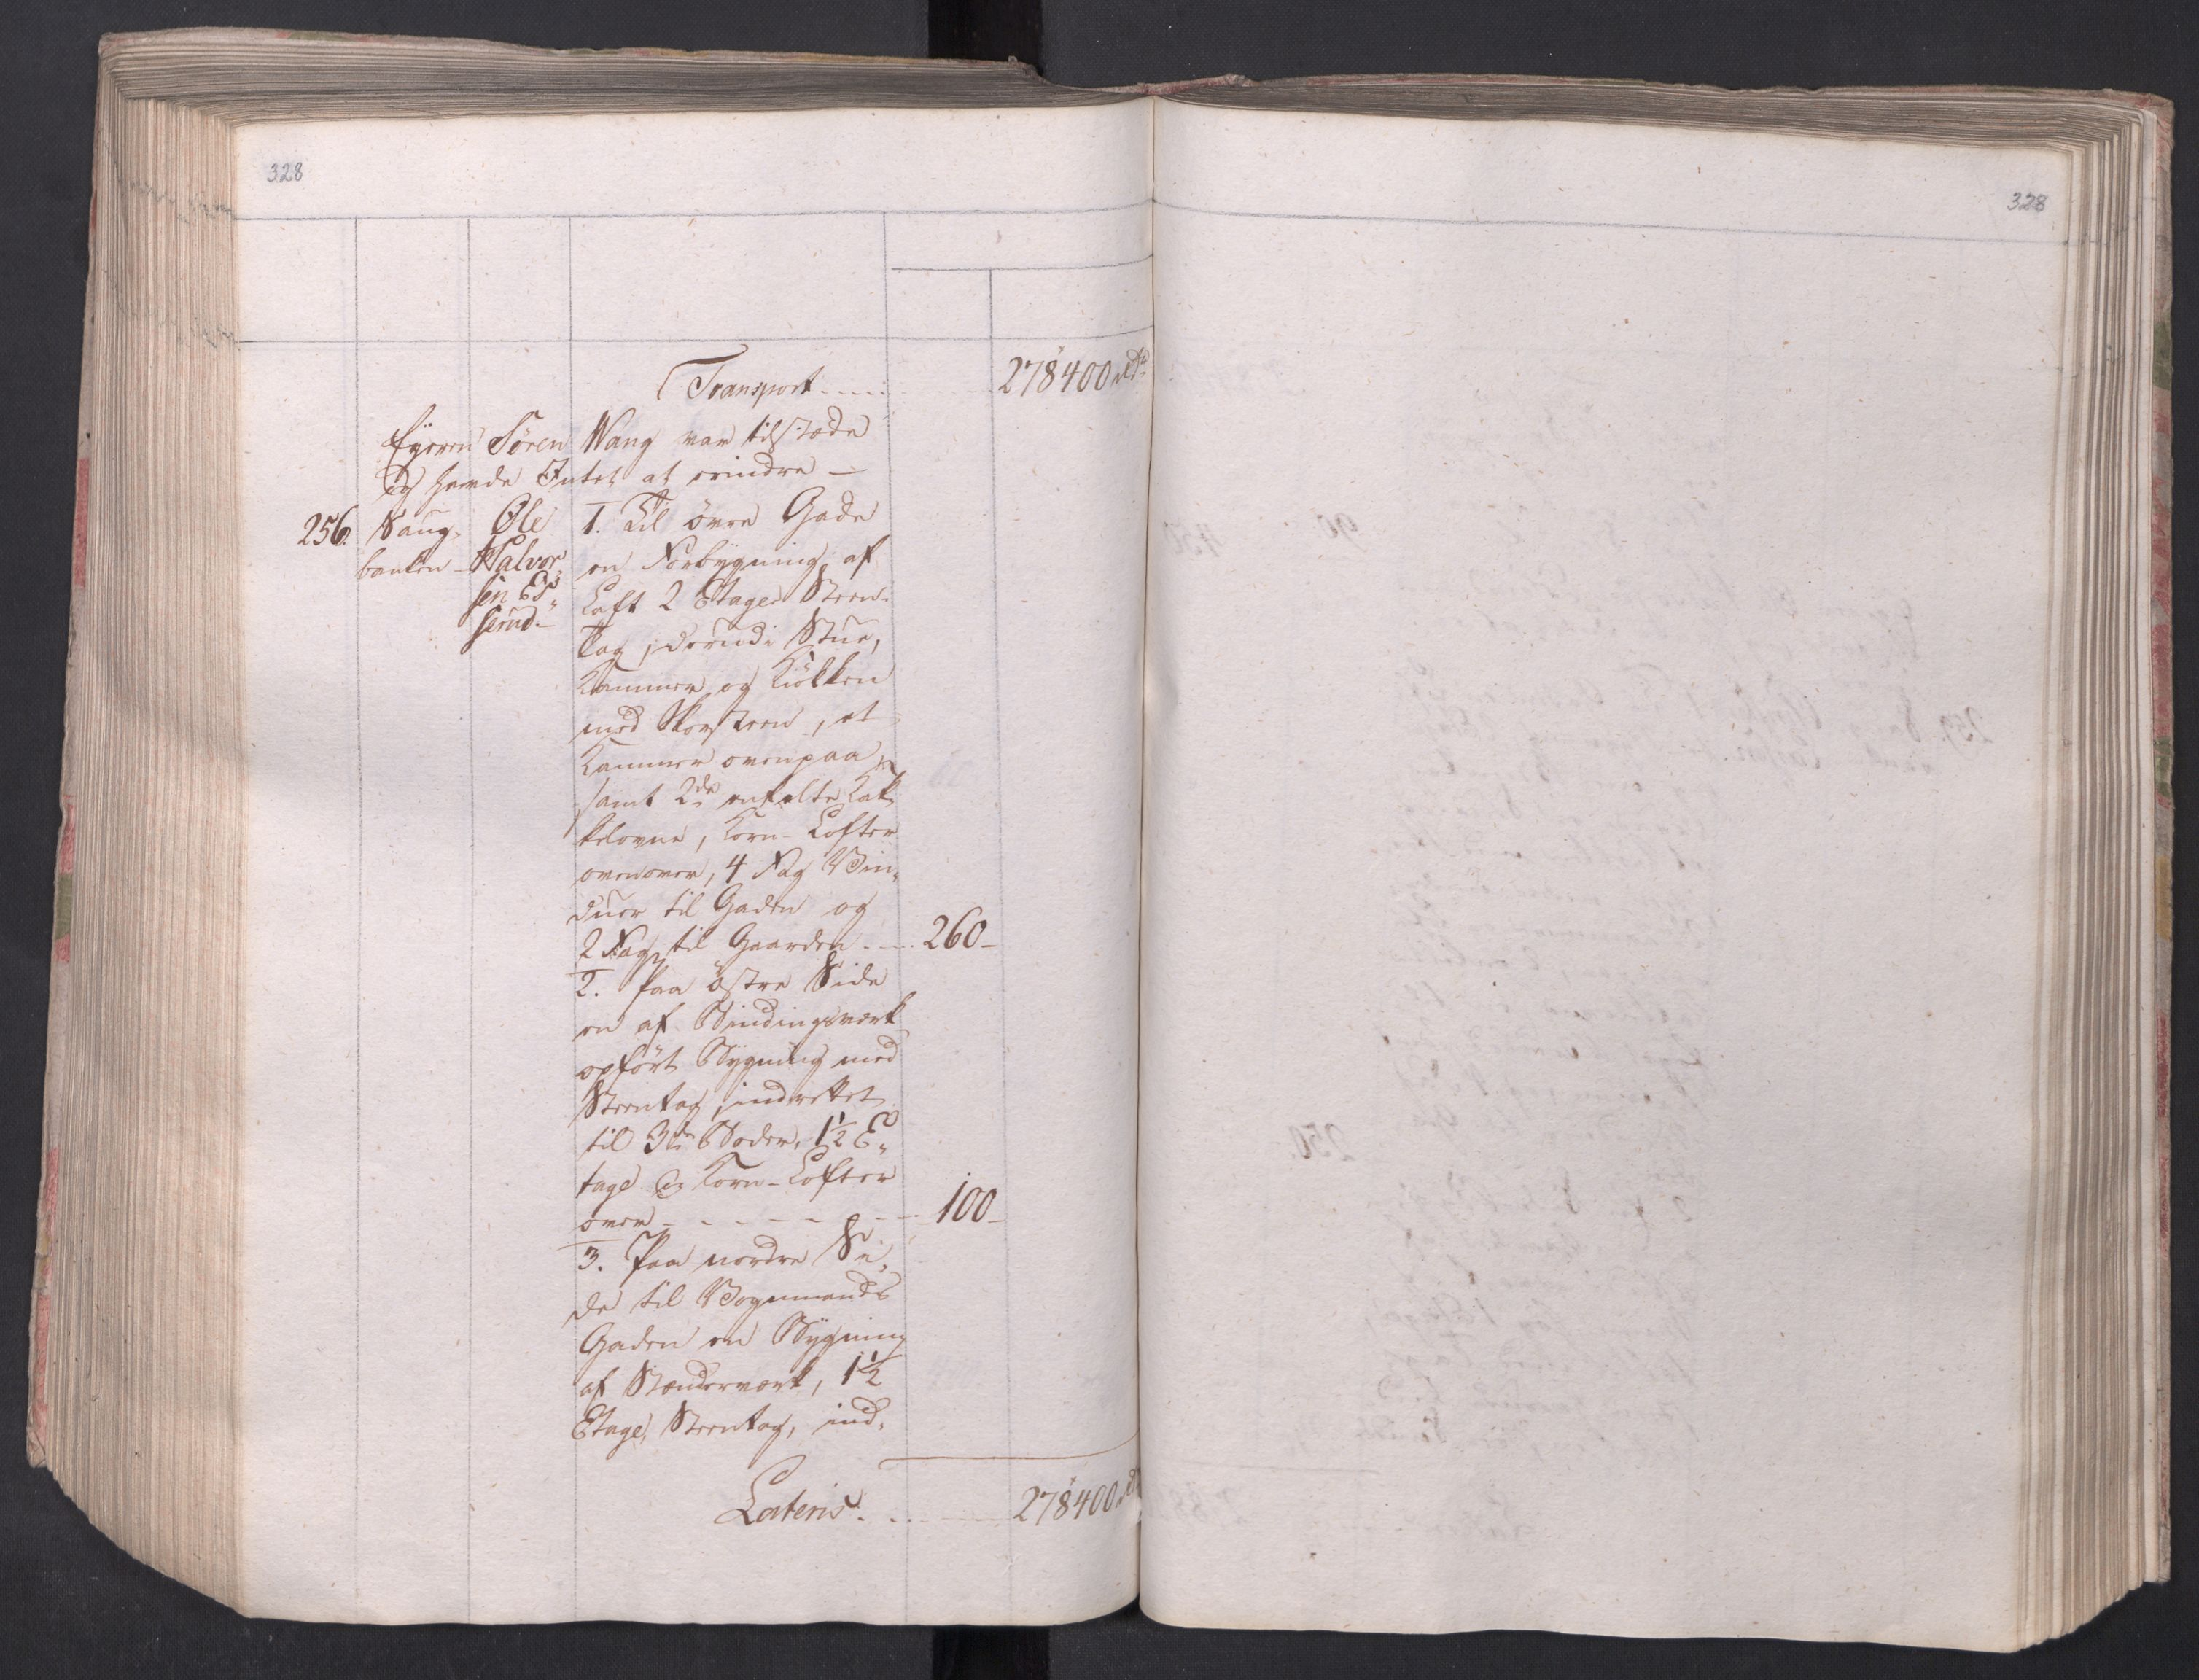 SAO, Kristiania stiftamt, I/Ia/L0015: Branntakster, 1797, s. 328